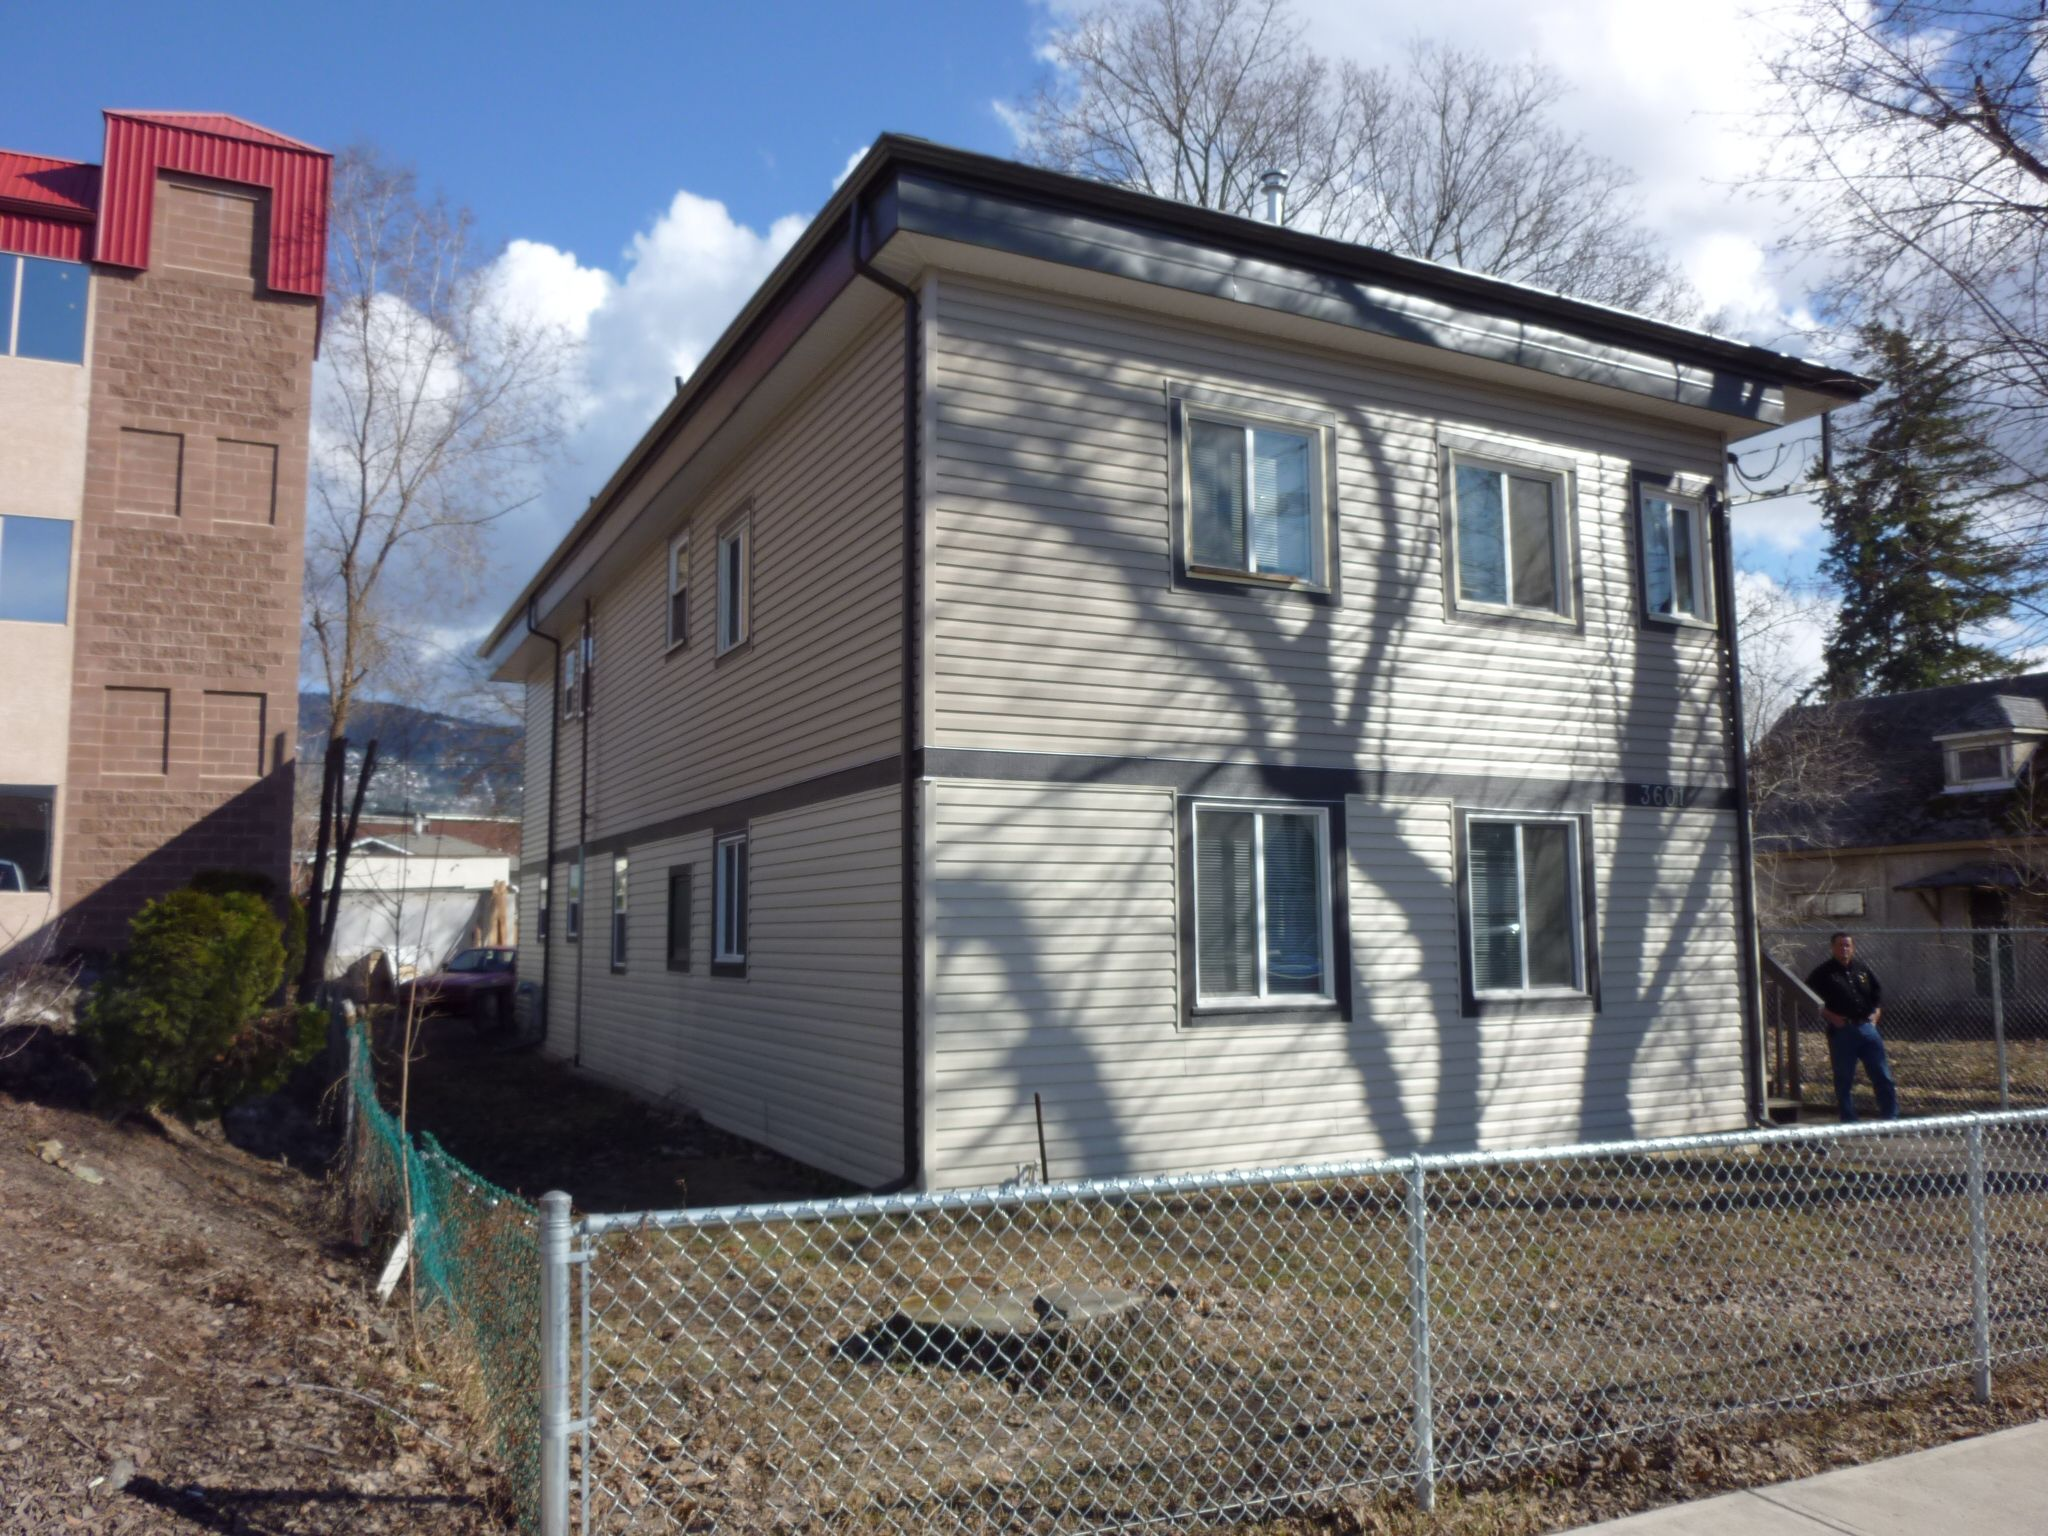 Main Photo: 3601 31 Street in Vernon: City of Vernon Multi-family for sale (North Okanagan)  : MLS®# 10042365